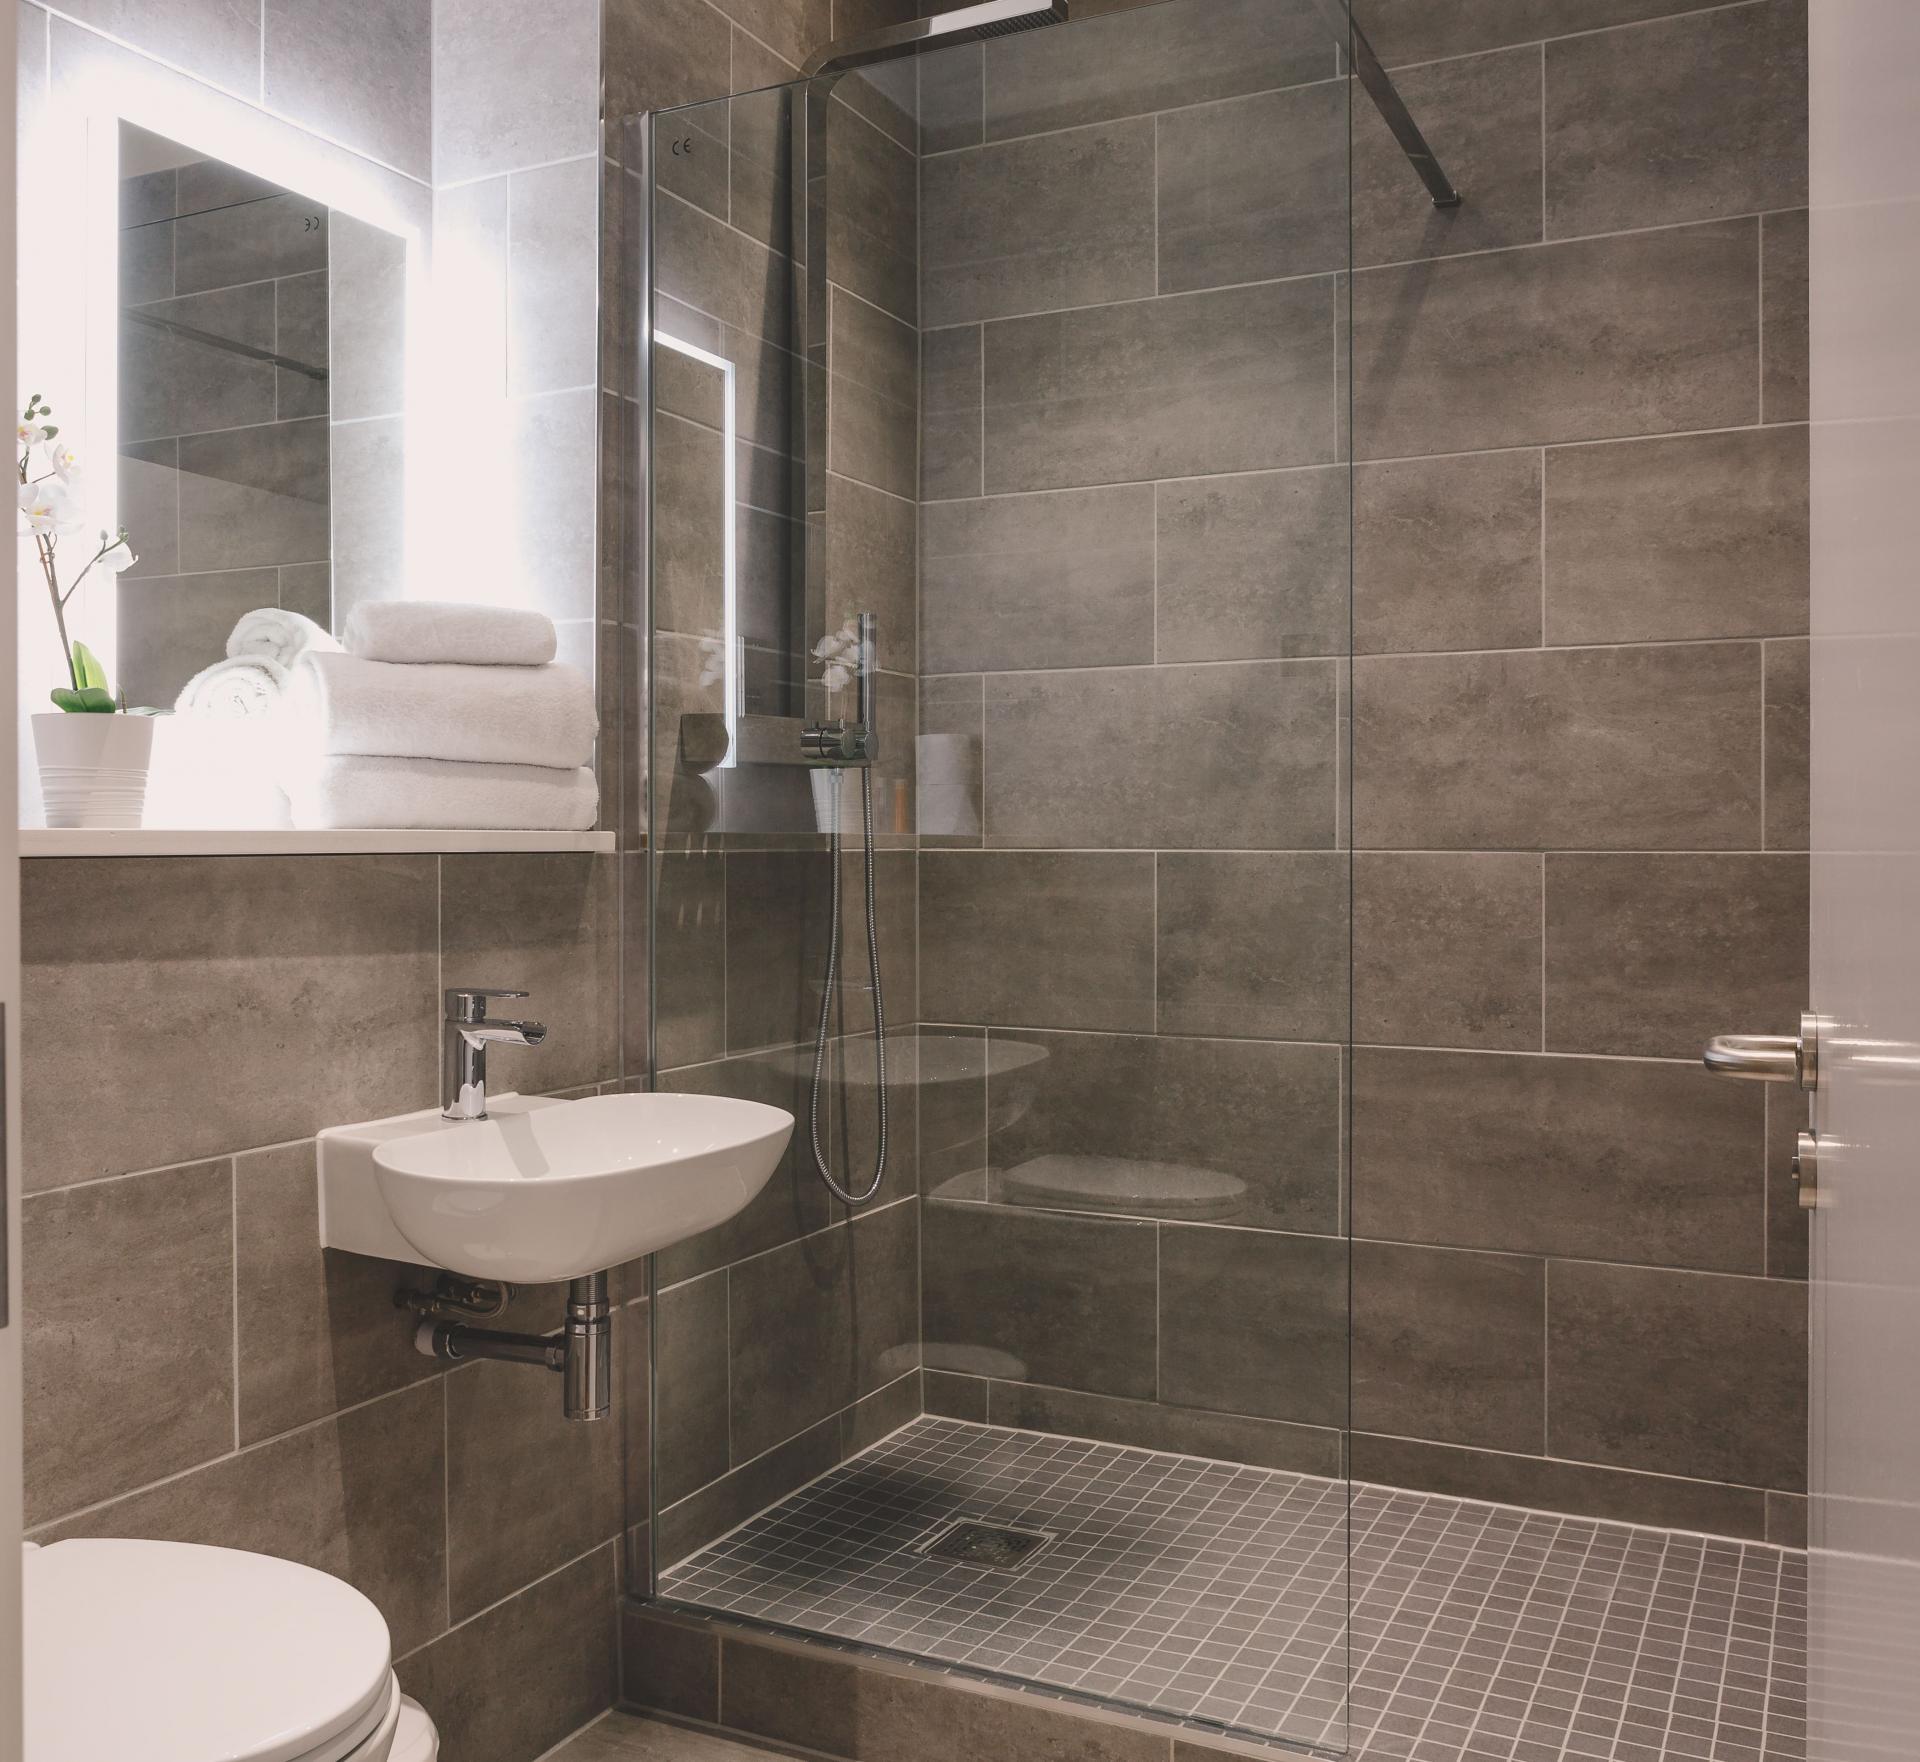 Bathroom at Park Lane Aparthotel, Centre, Cardiff - Citybase Apartments